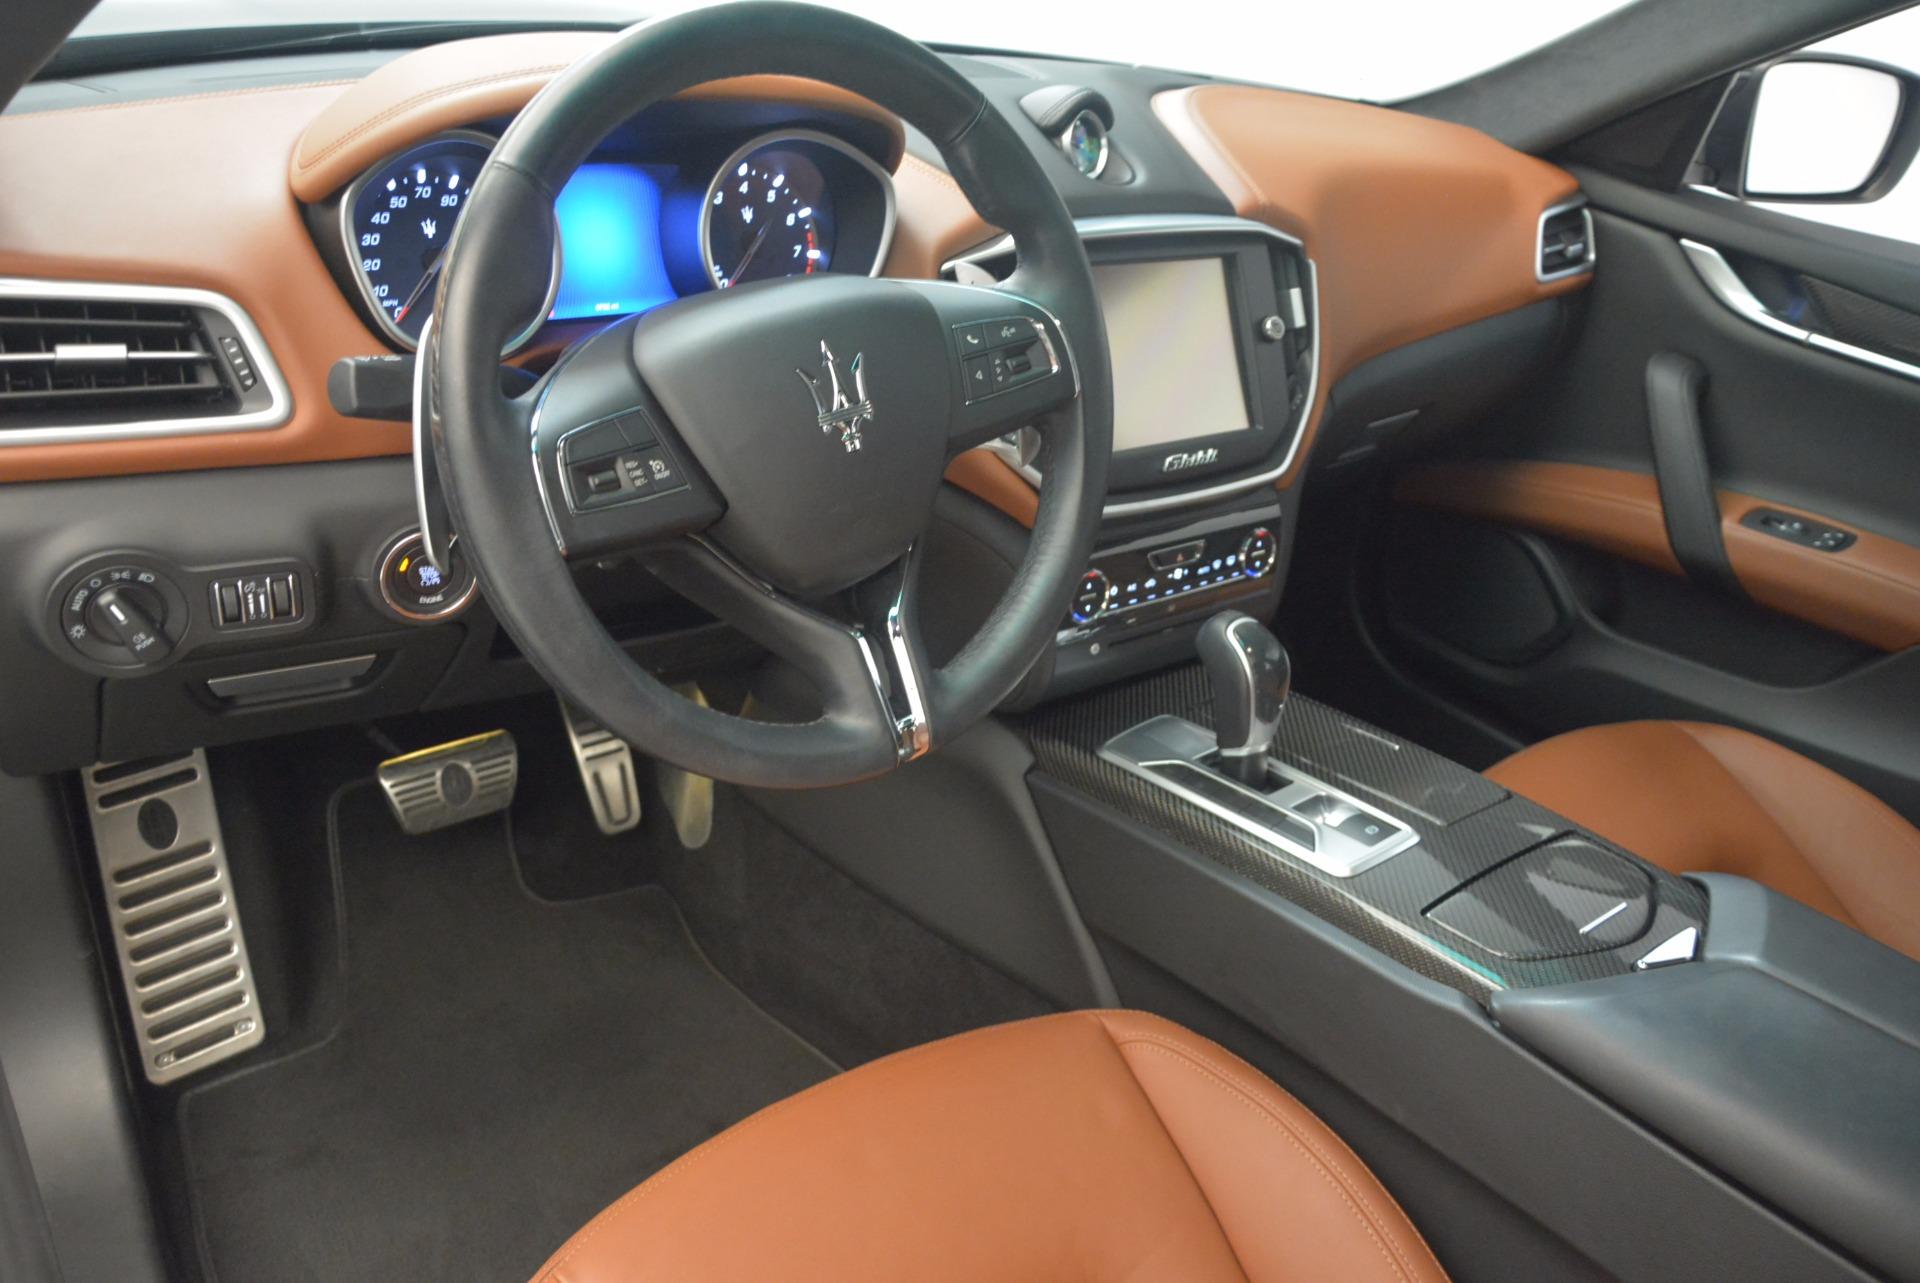 Used 2014 Maserati Ghibli S Q4 For Sale In Greenwich, CT. Alfa Romeo of Greenwich, 7281 1587_p14